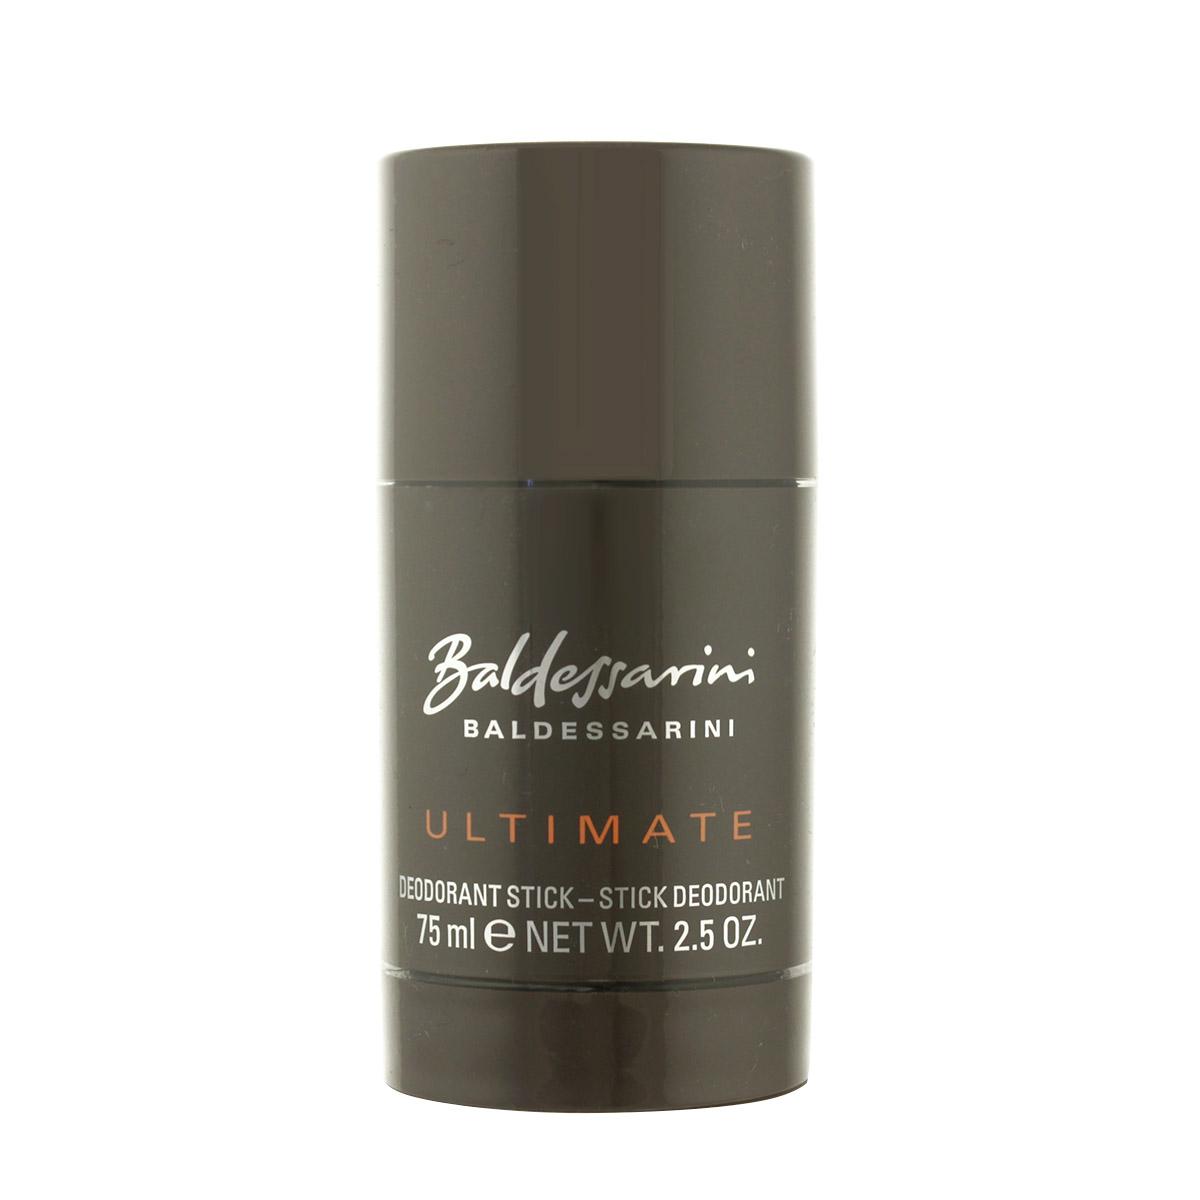 Baldessarini Ultimate DST 75 ml M